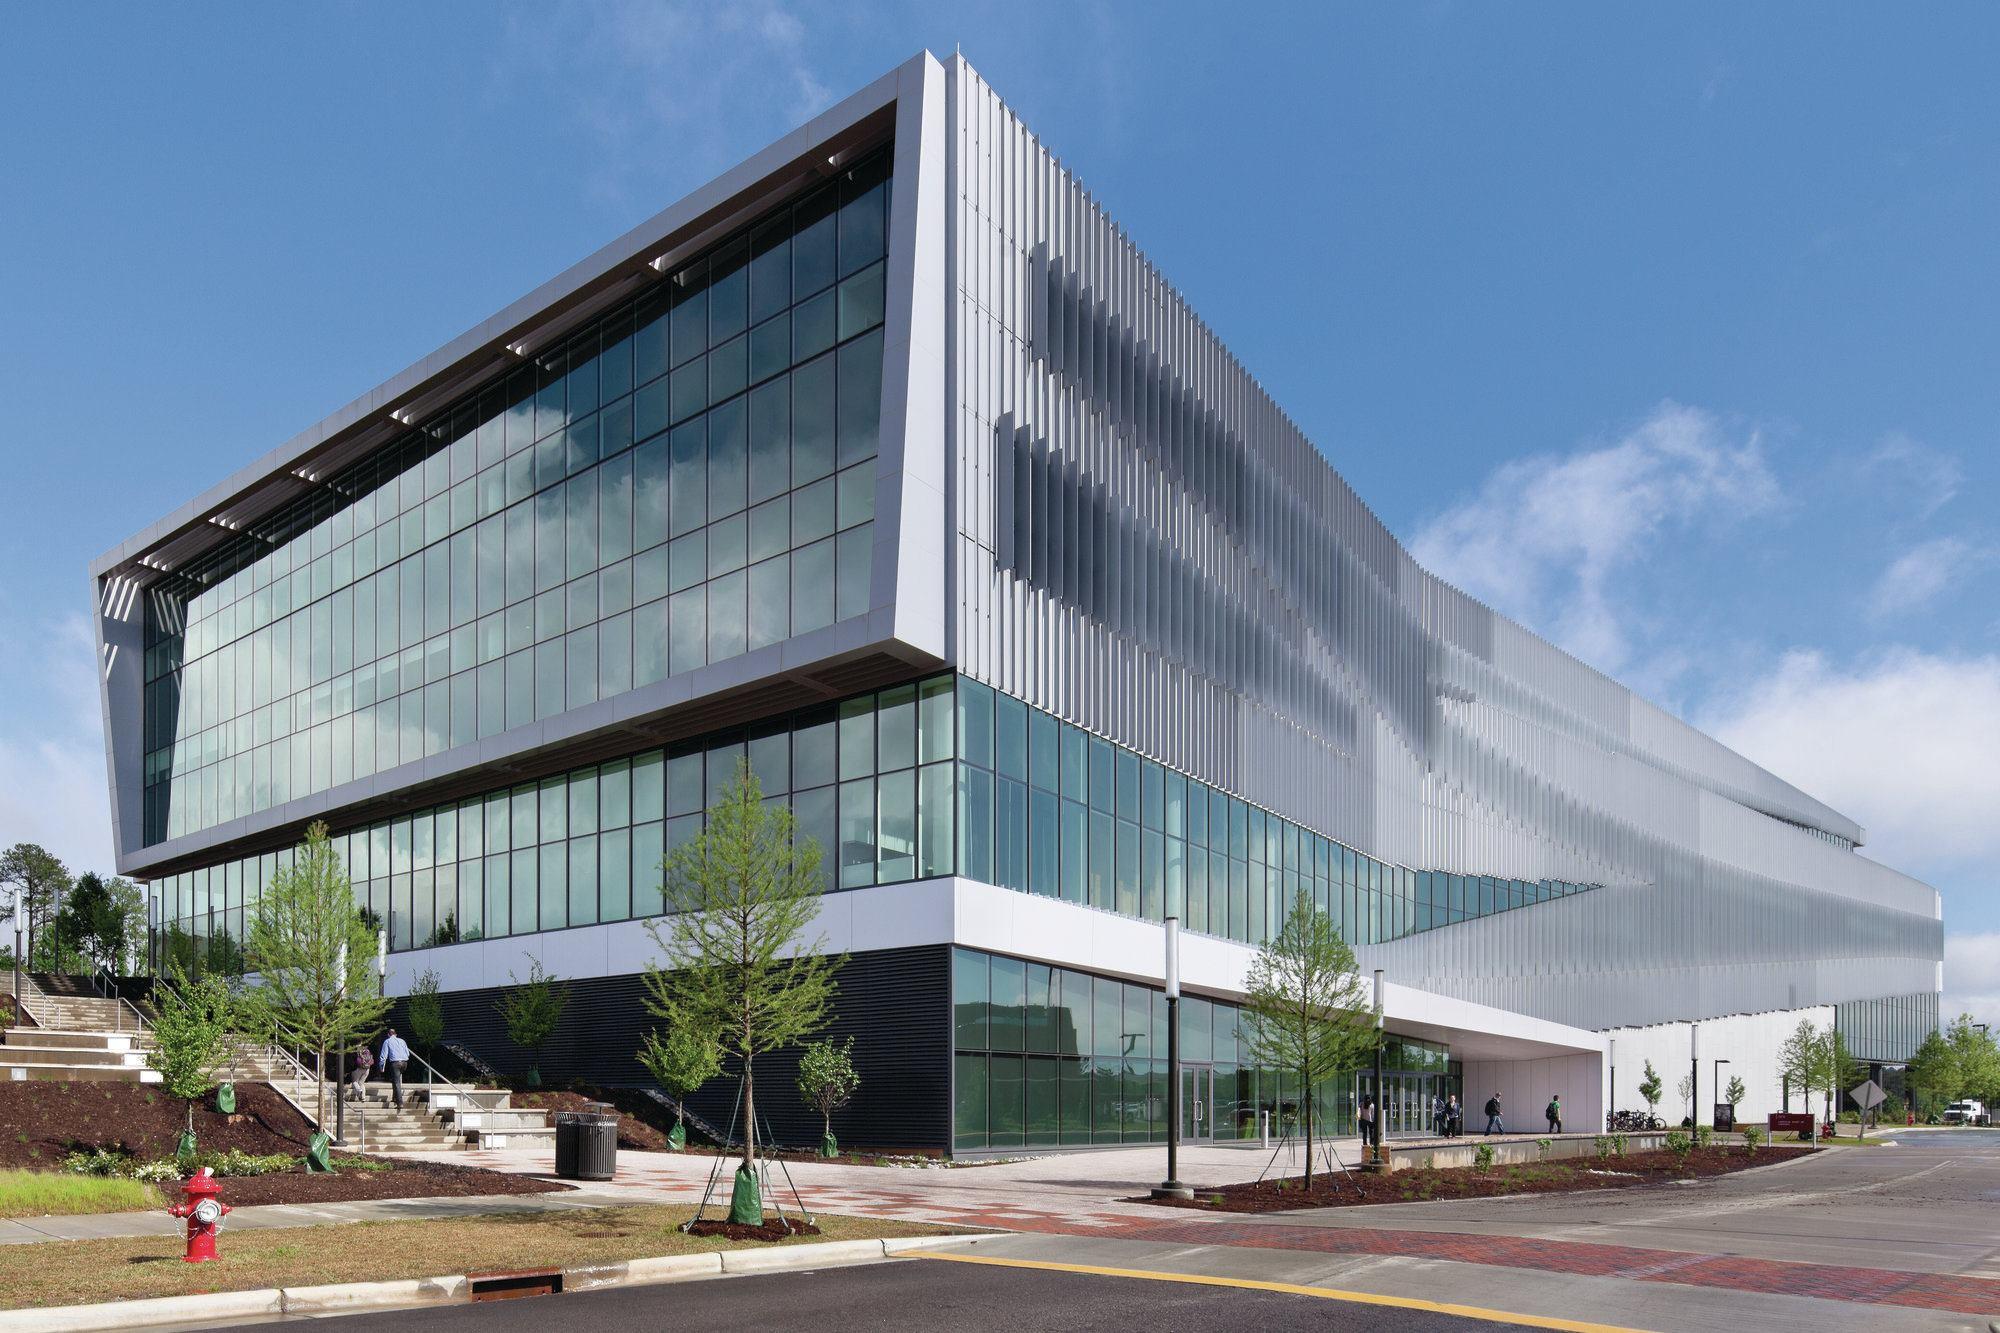 Residential Building Front Elevation : James b hunt jr library designed by snøhetta